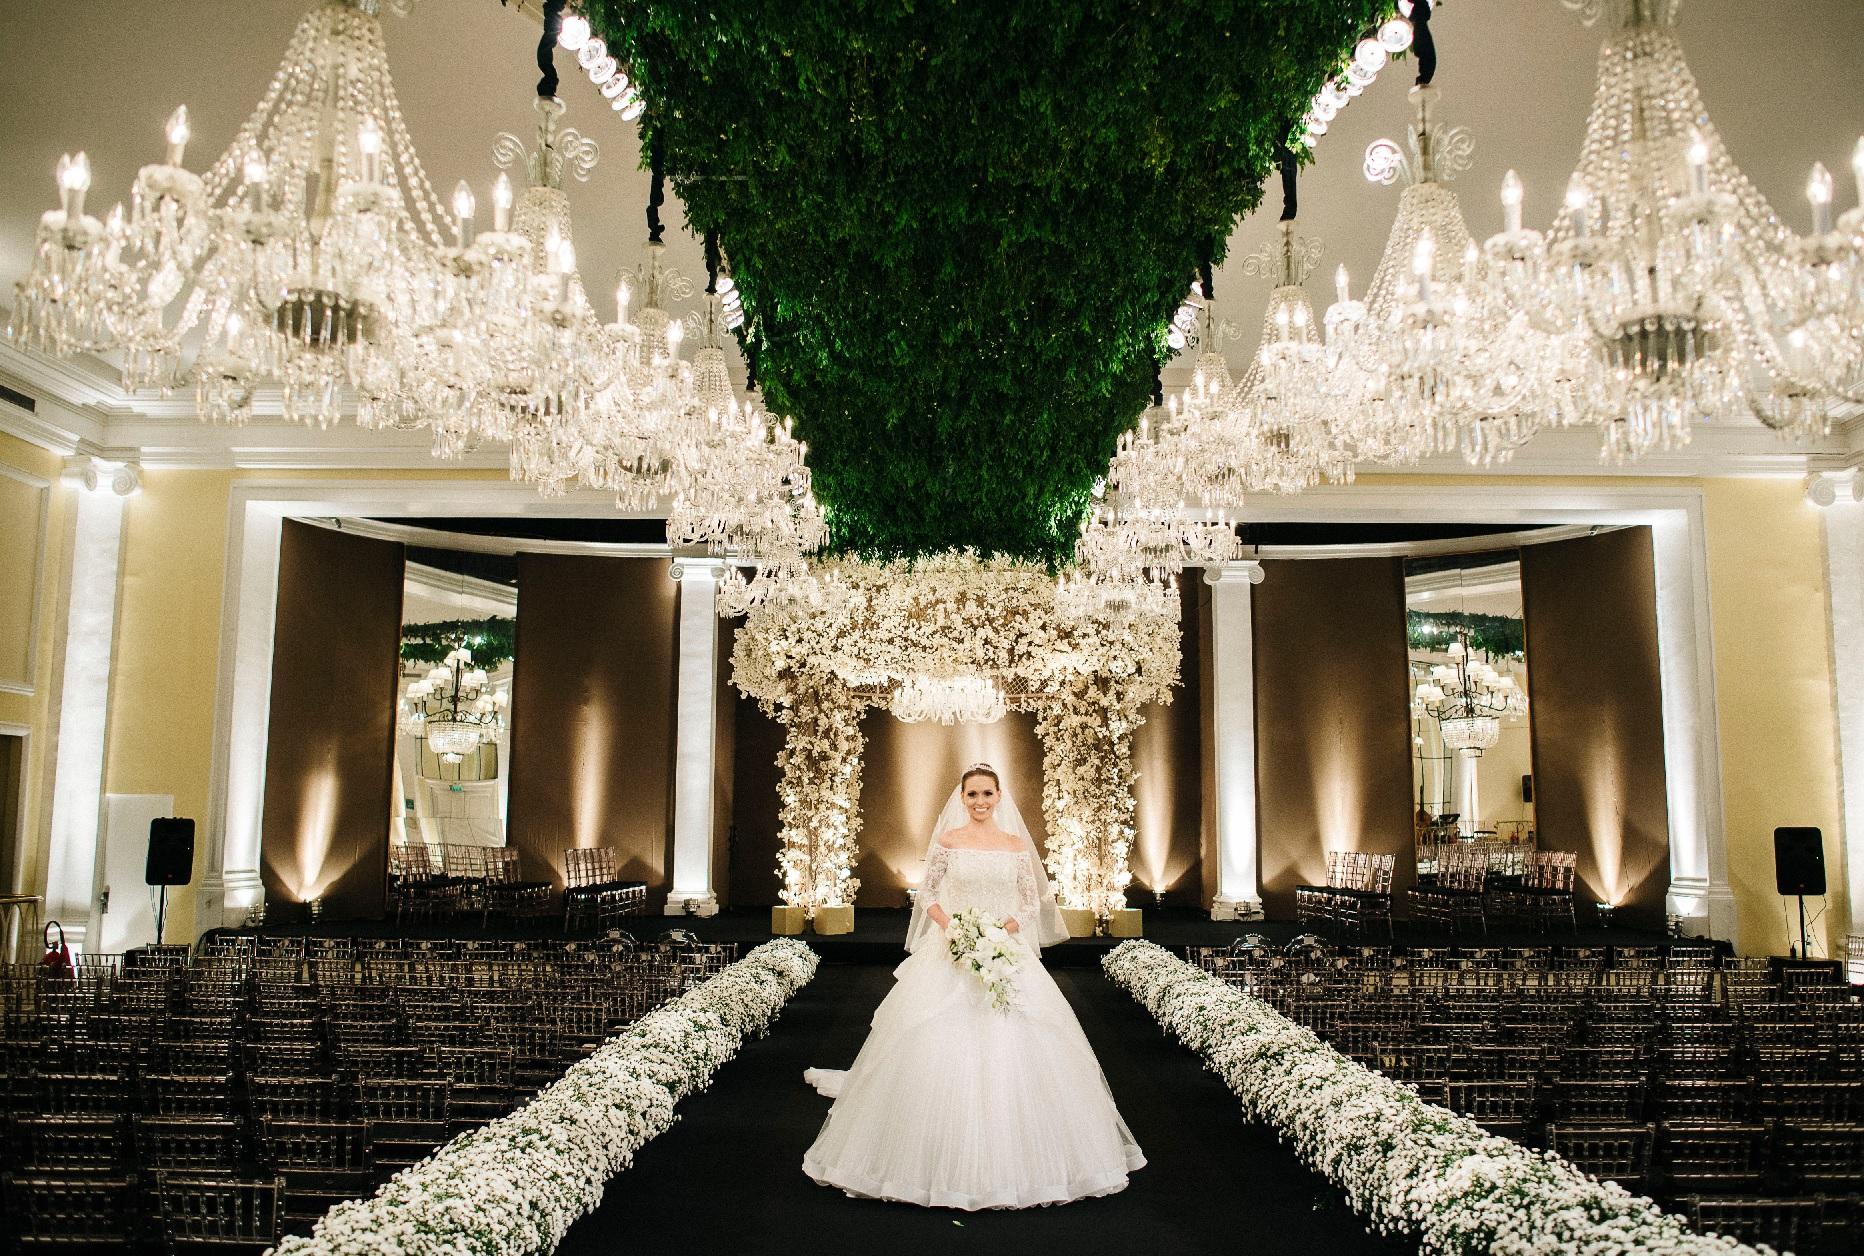 casamento-yael-cohen-noiva-2